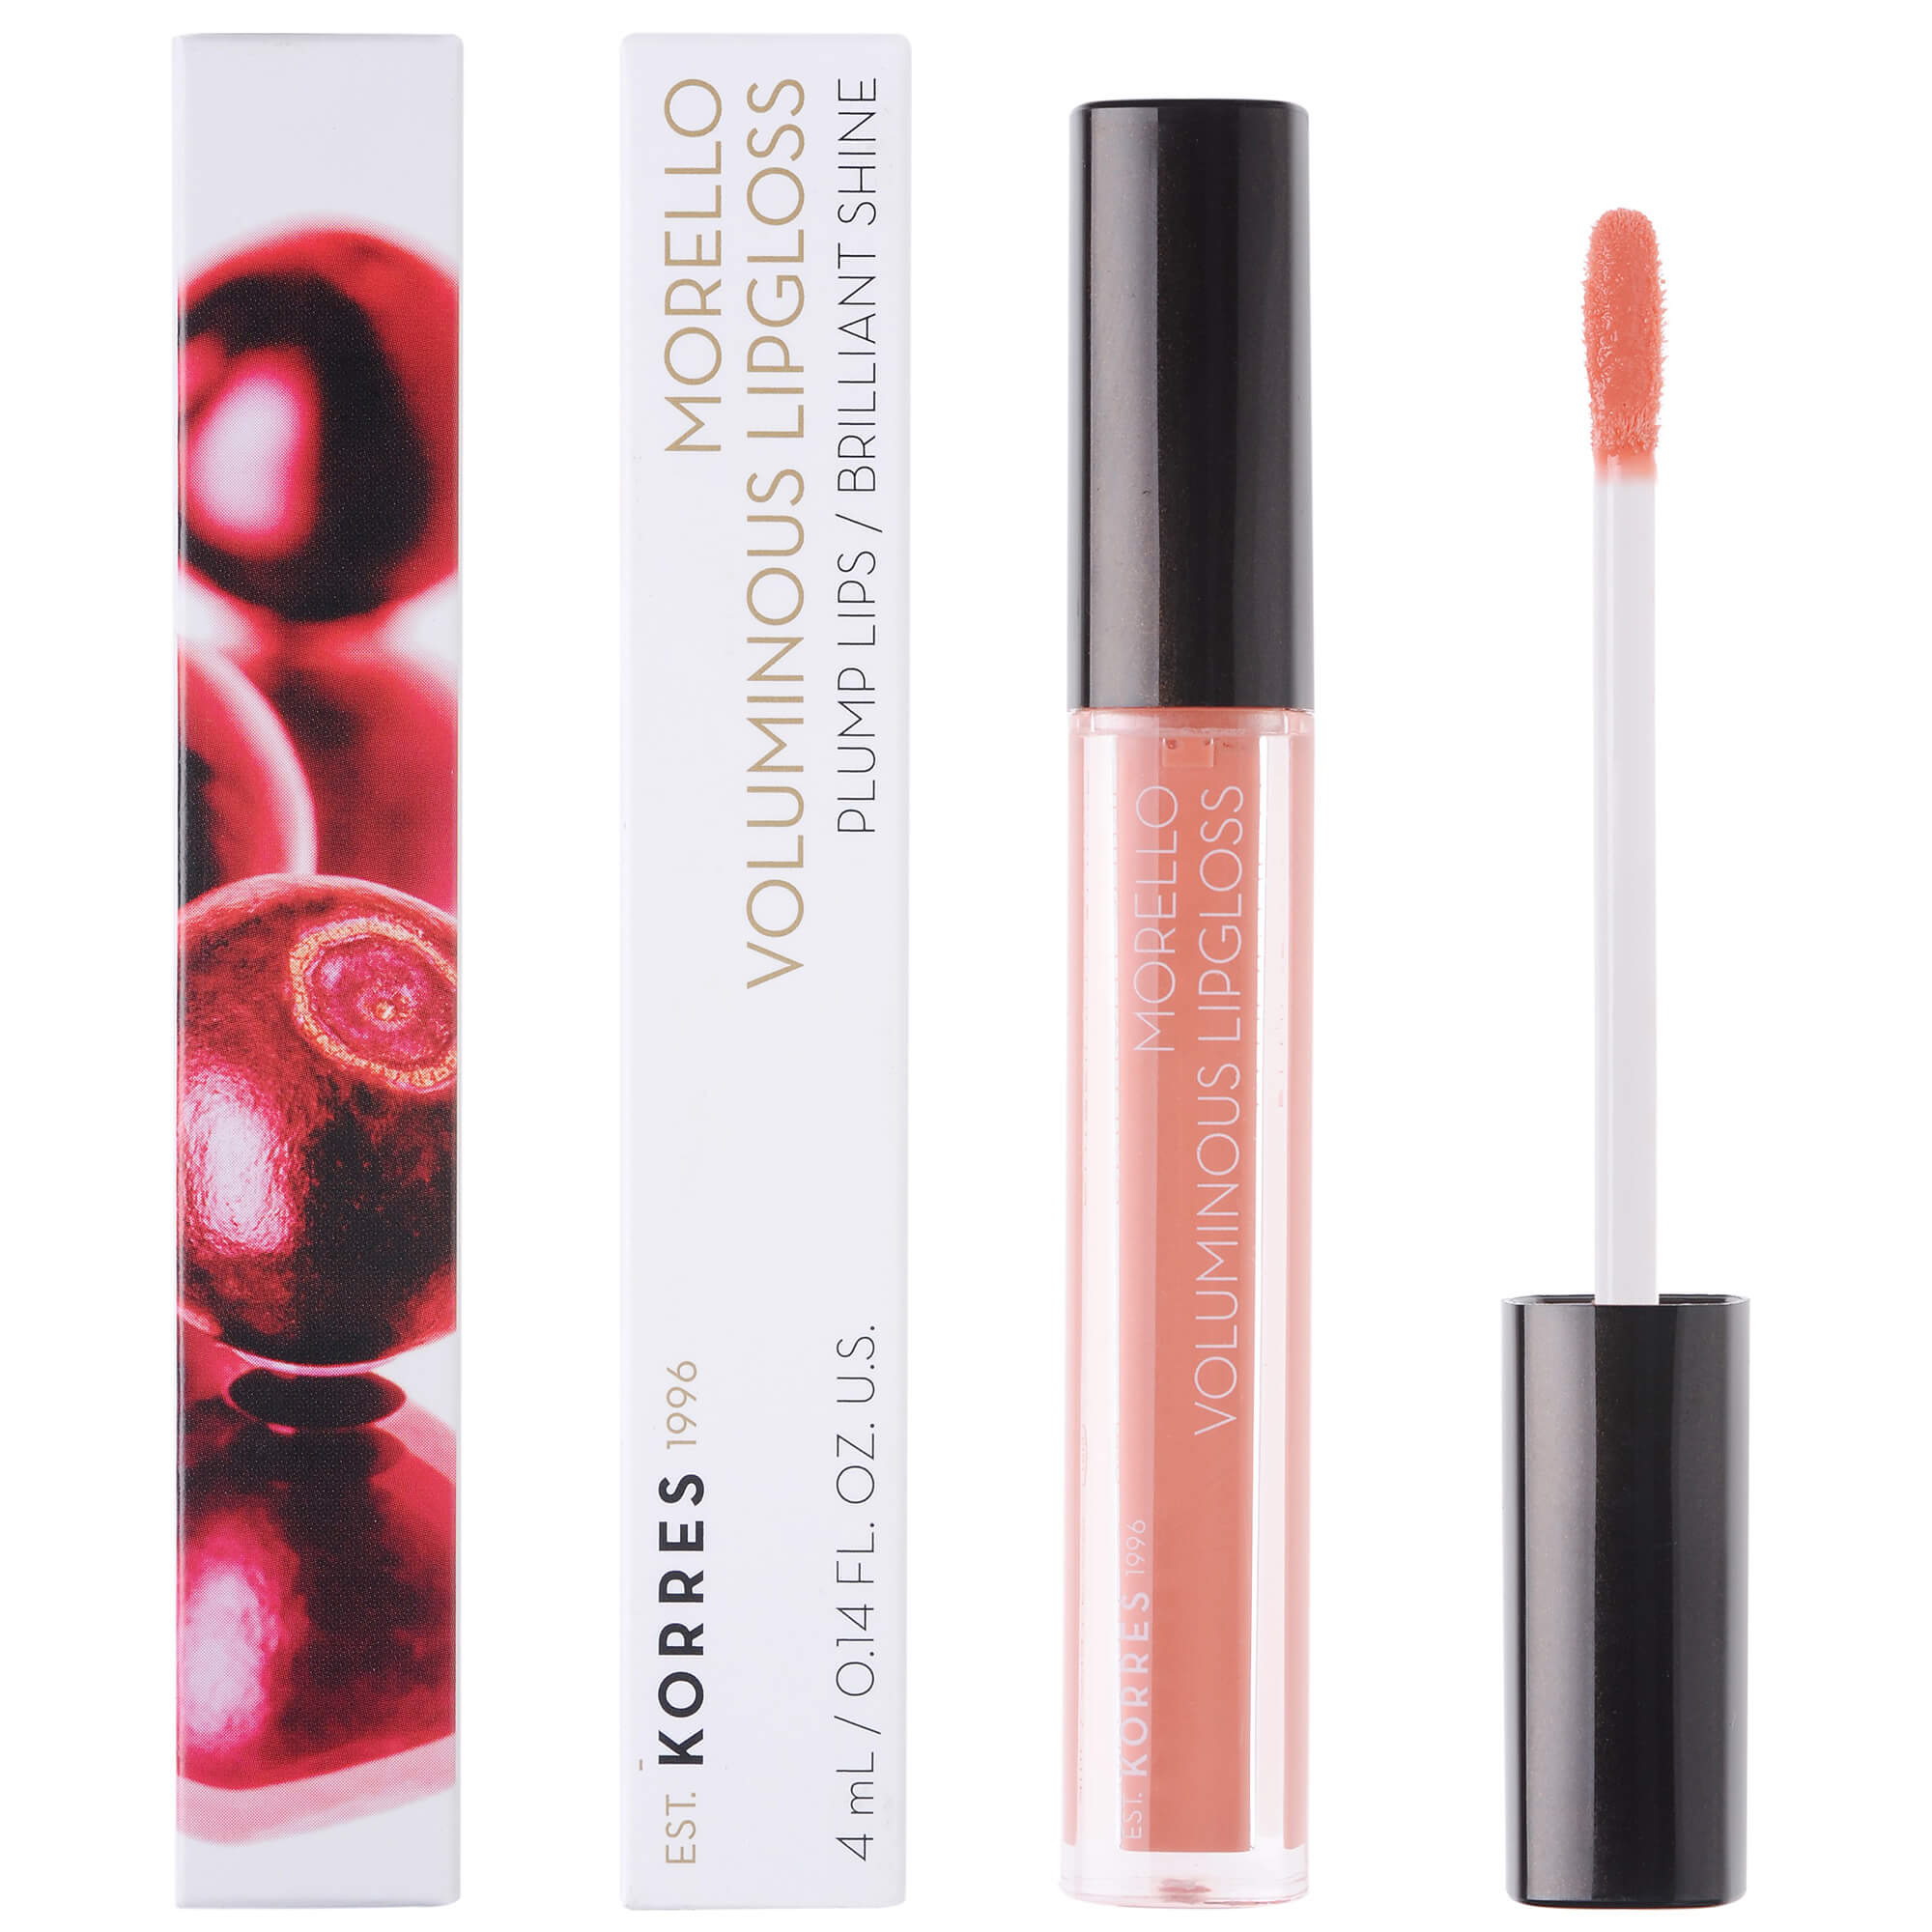 Korres Morello Voluminous Lipgloss Brilliant Shine Ενυδατικό Lipgloss με Εξαιρετική Λάμψη & Γεμάτο Χρώμα που Διαρκεί 4ml – 12 Candy Pink